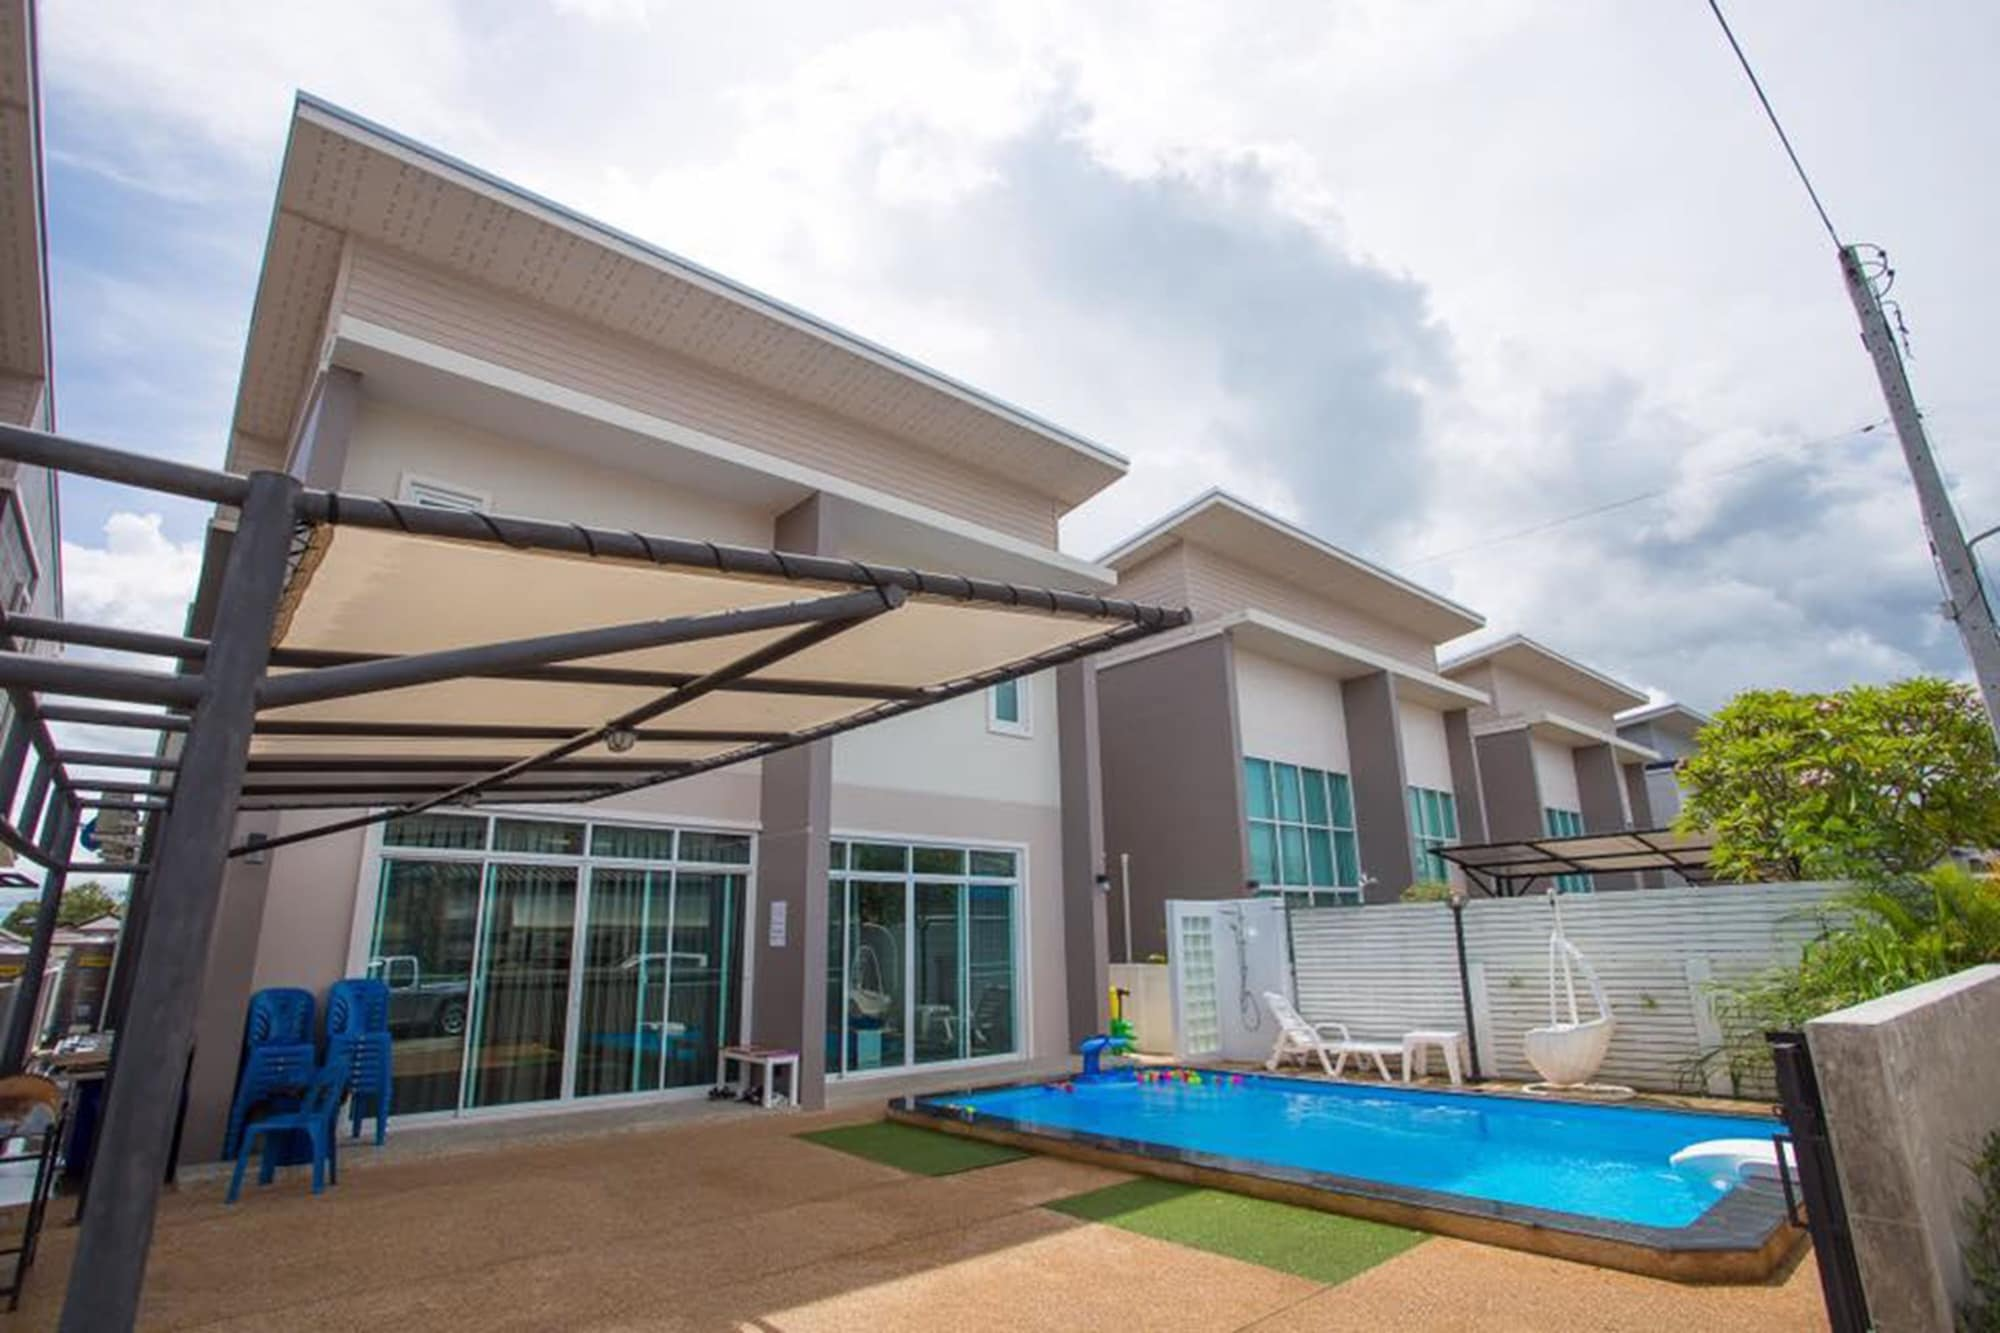 Club 51 Hua Hin Pool Villa, Hua Hin